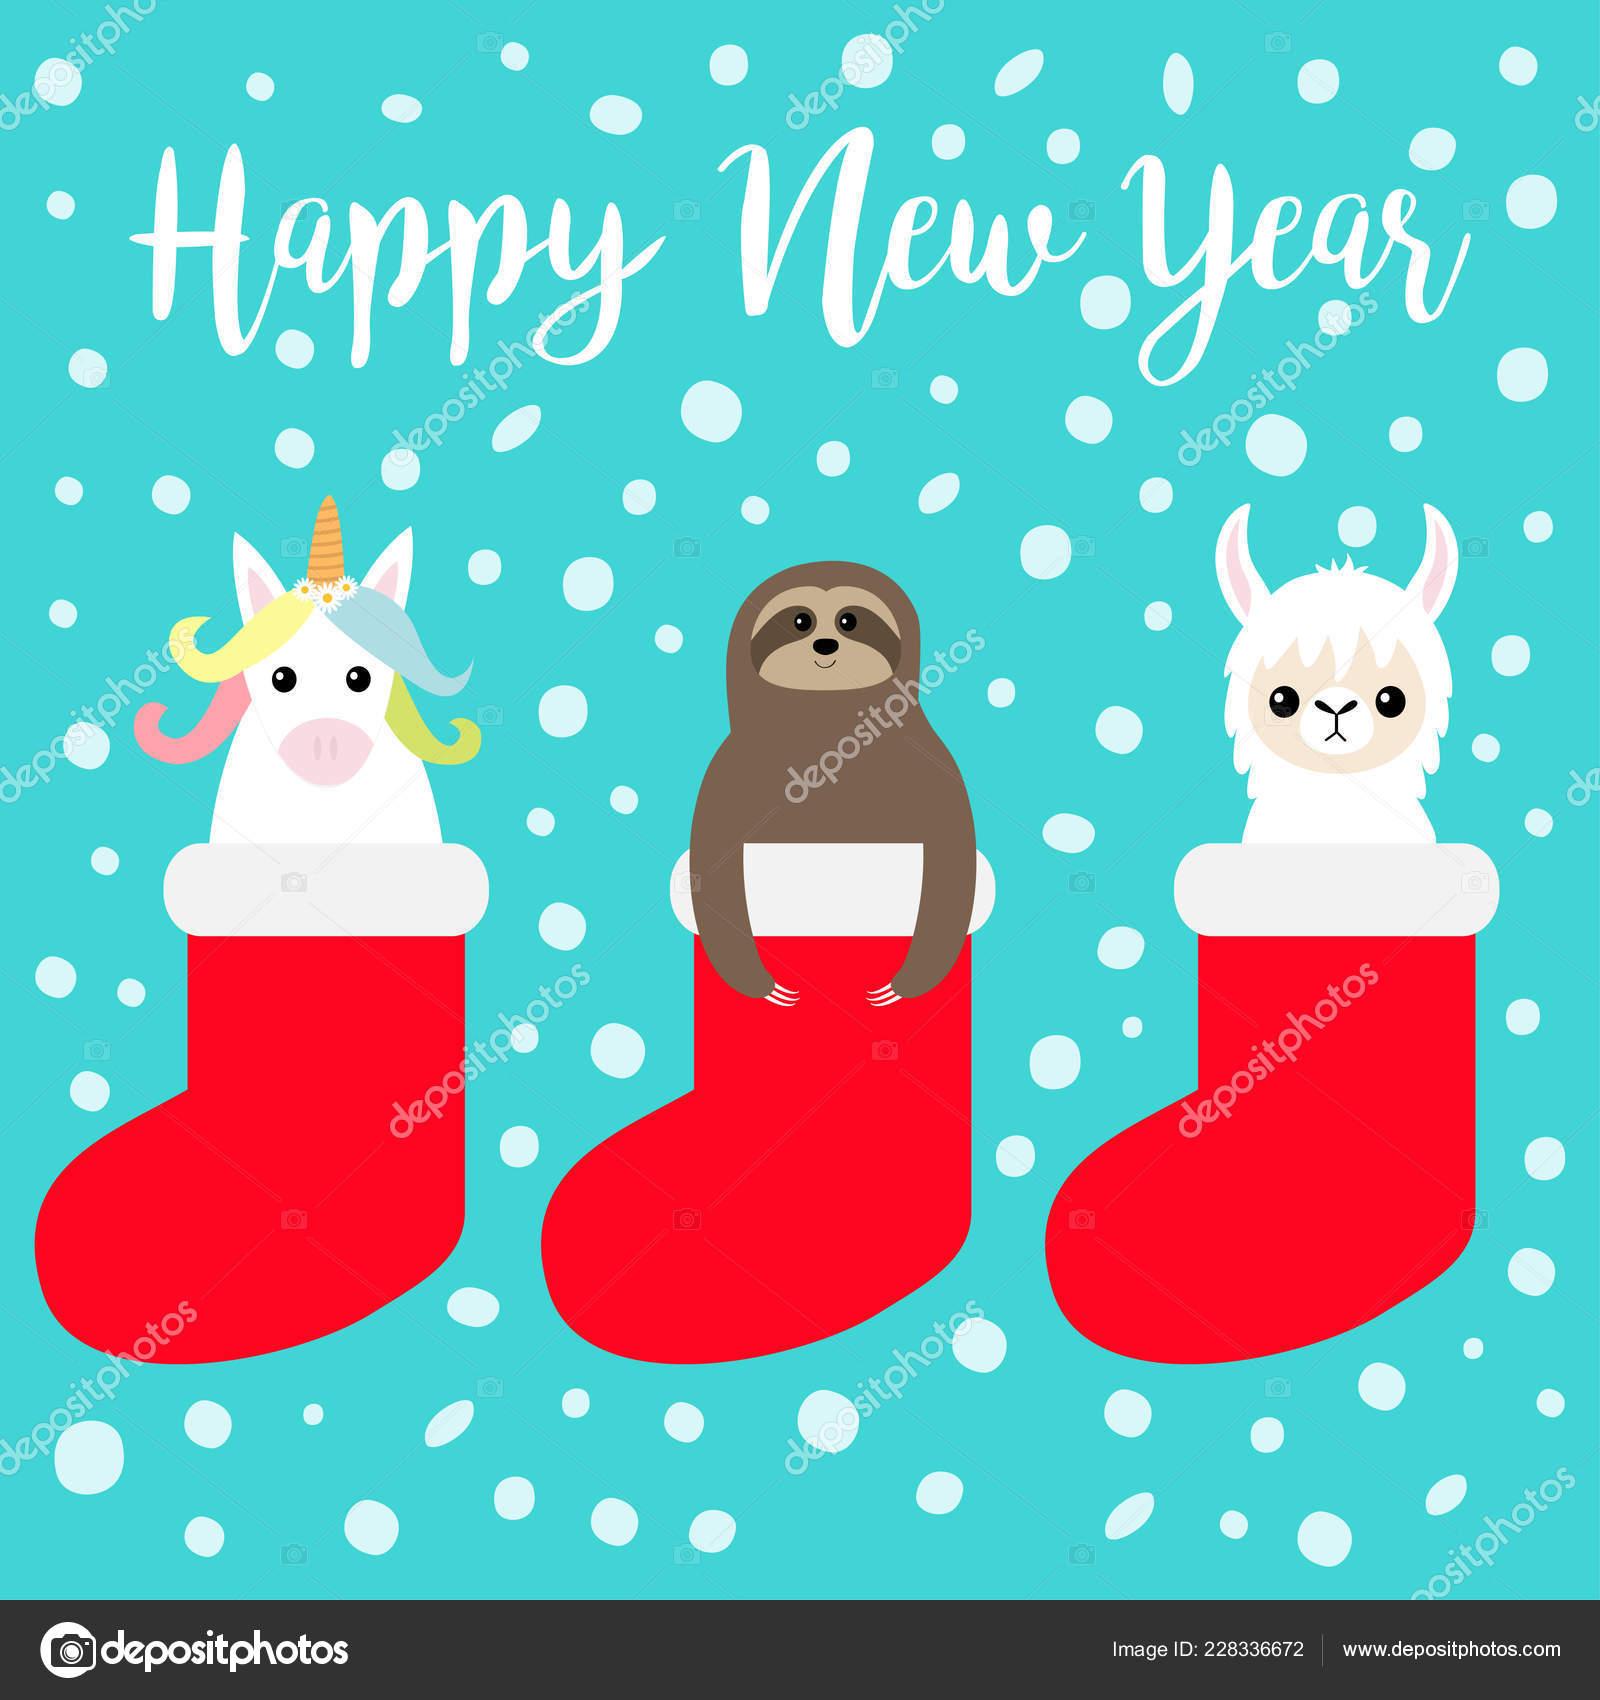 happy new year llama alpaca sloth unicorn in red sock snow flake merry christmas cute cartoon funny kawaii character t shirt greeting card